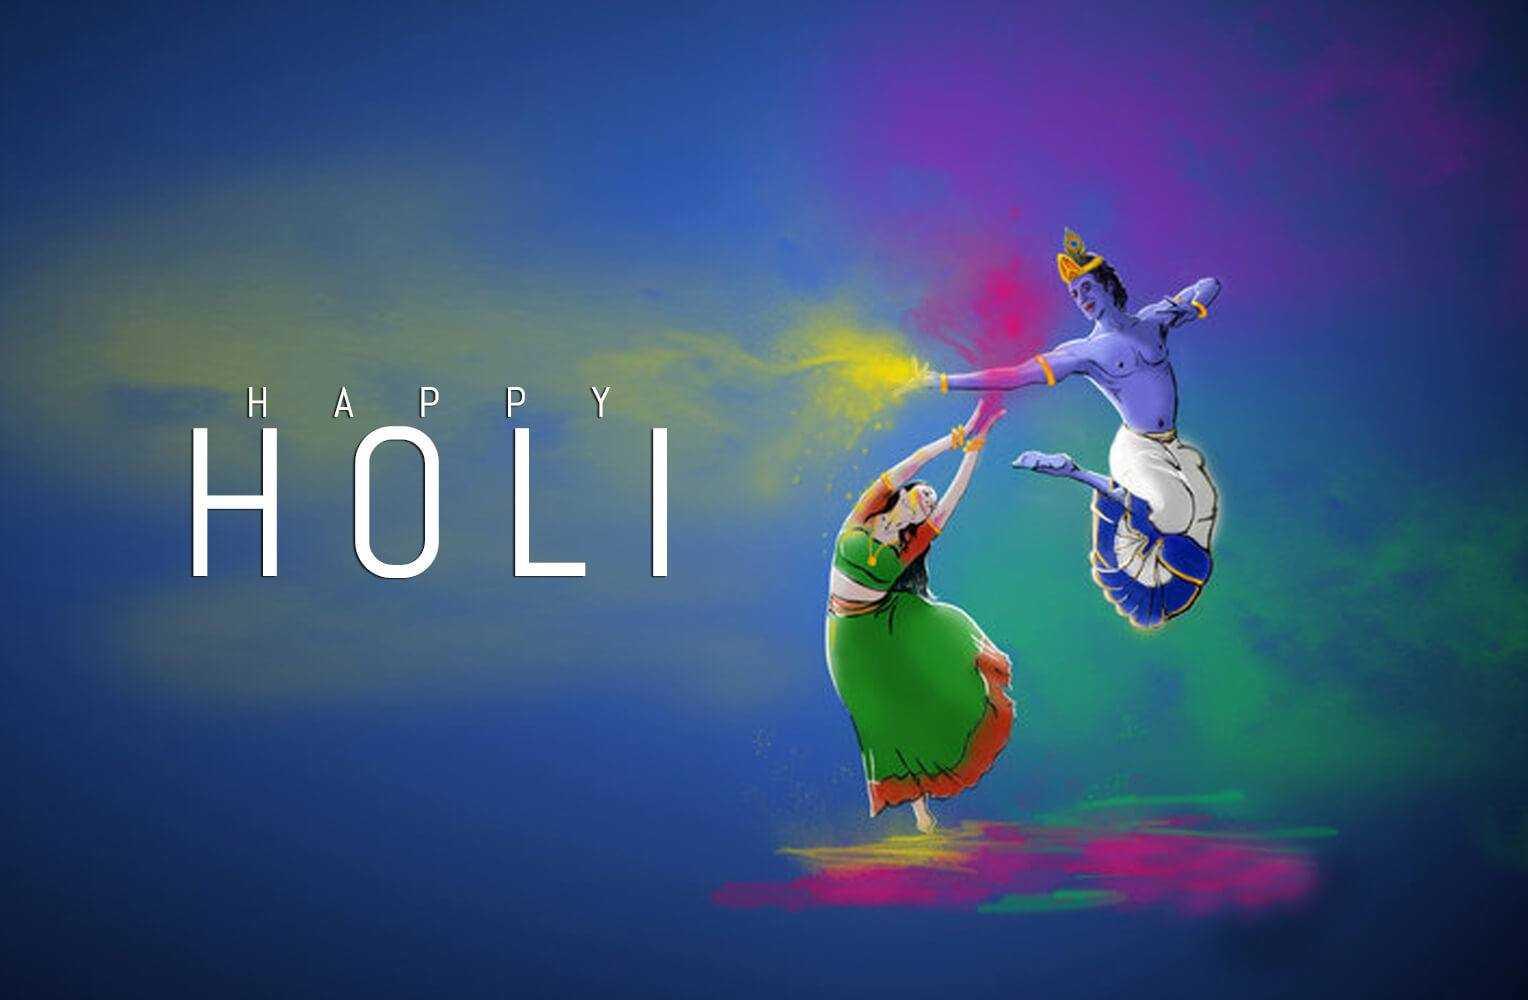 Holi Wallpaper HD with Radha Krishna for Whatsapp - Holi Wallpaper HD with Radha Krishna for Whatsapp